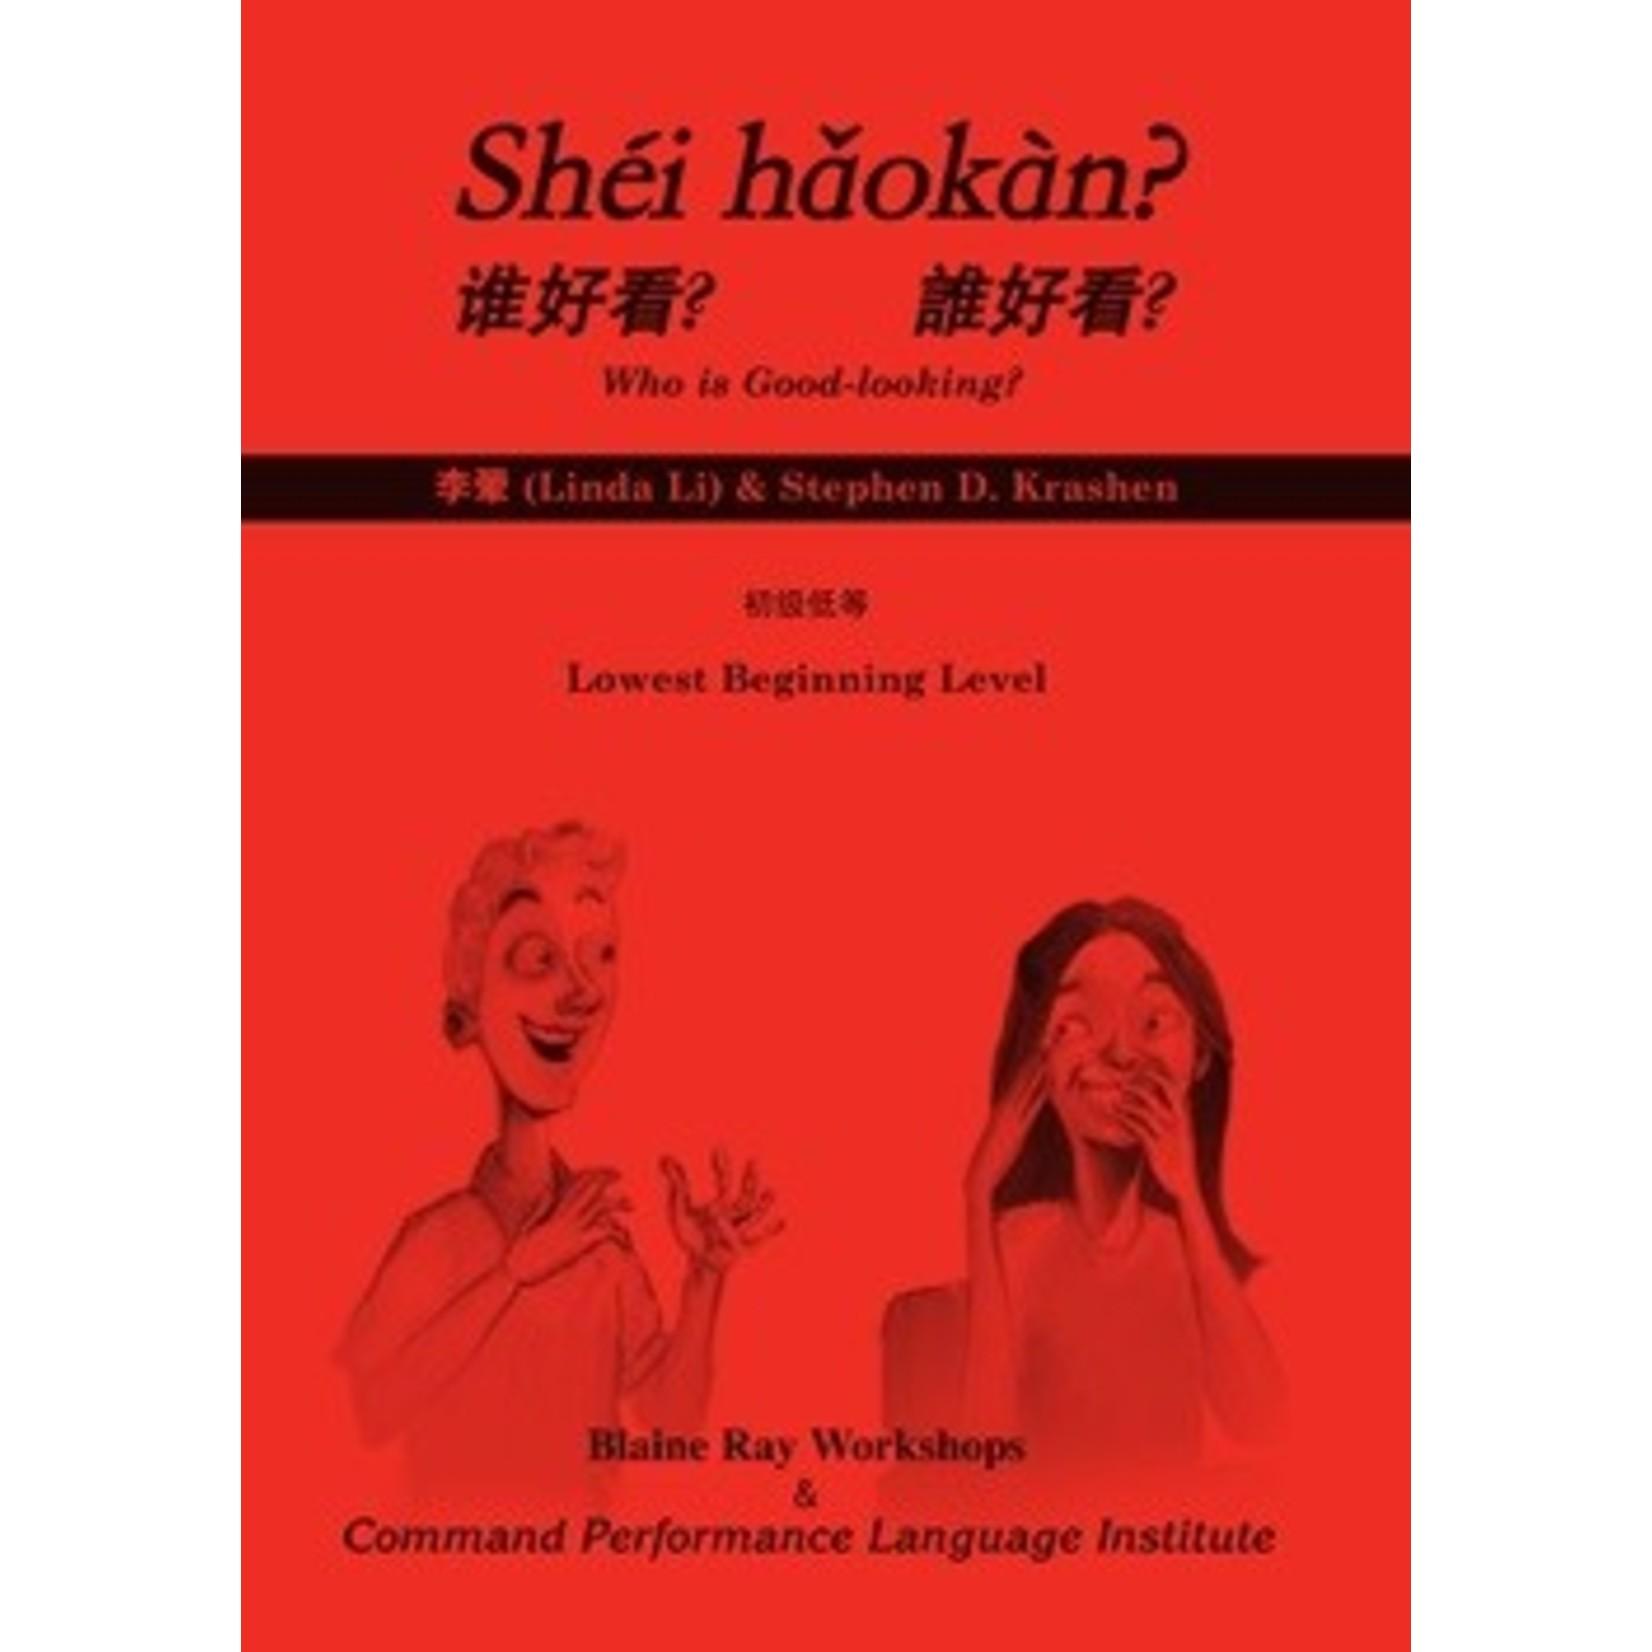 Command Performance Books Shéi hǎokàn? - 1st edition